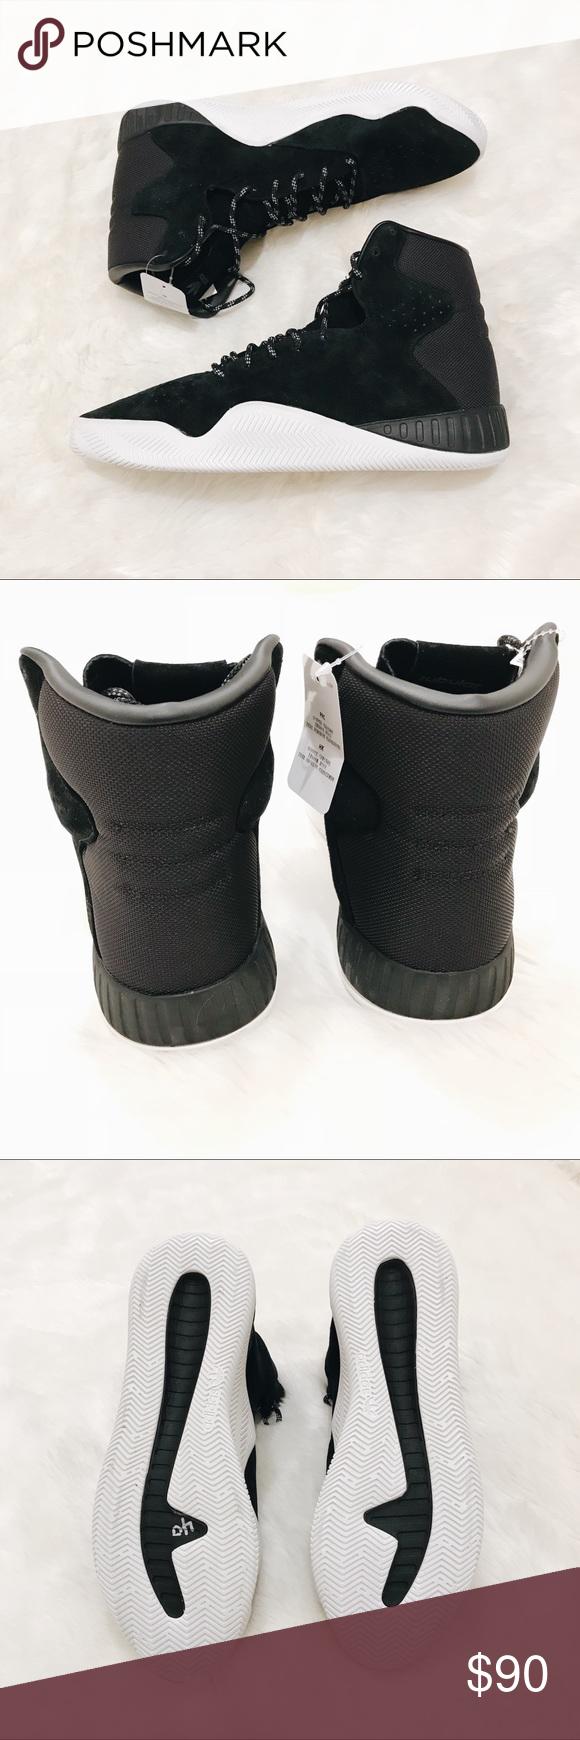 Adidas Tubular Black Instinct High Instinct Top 19214 Black | 919adae - rspr.host